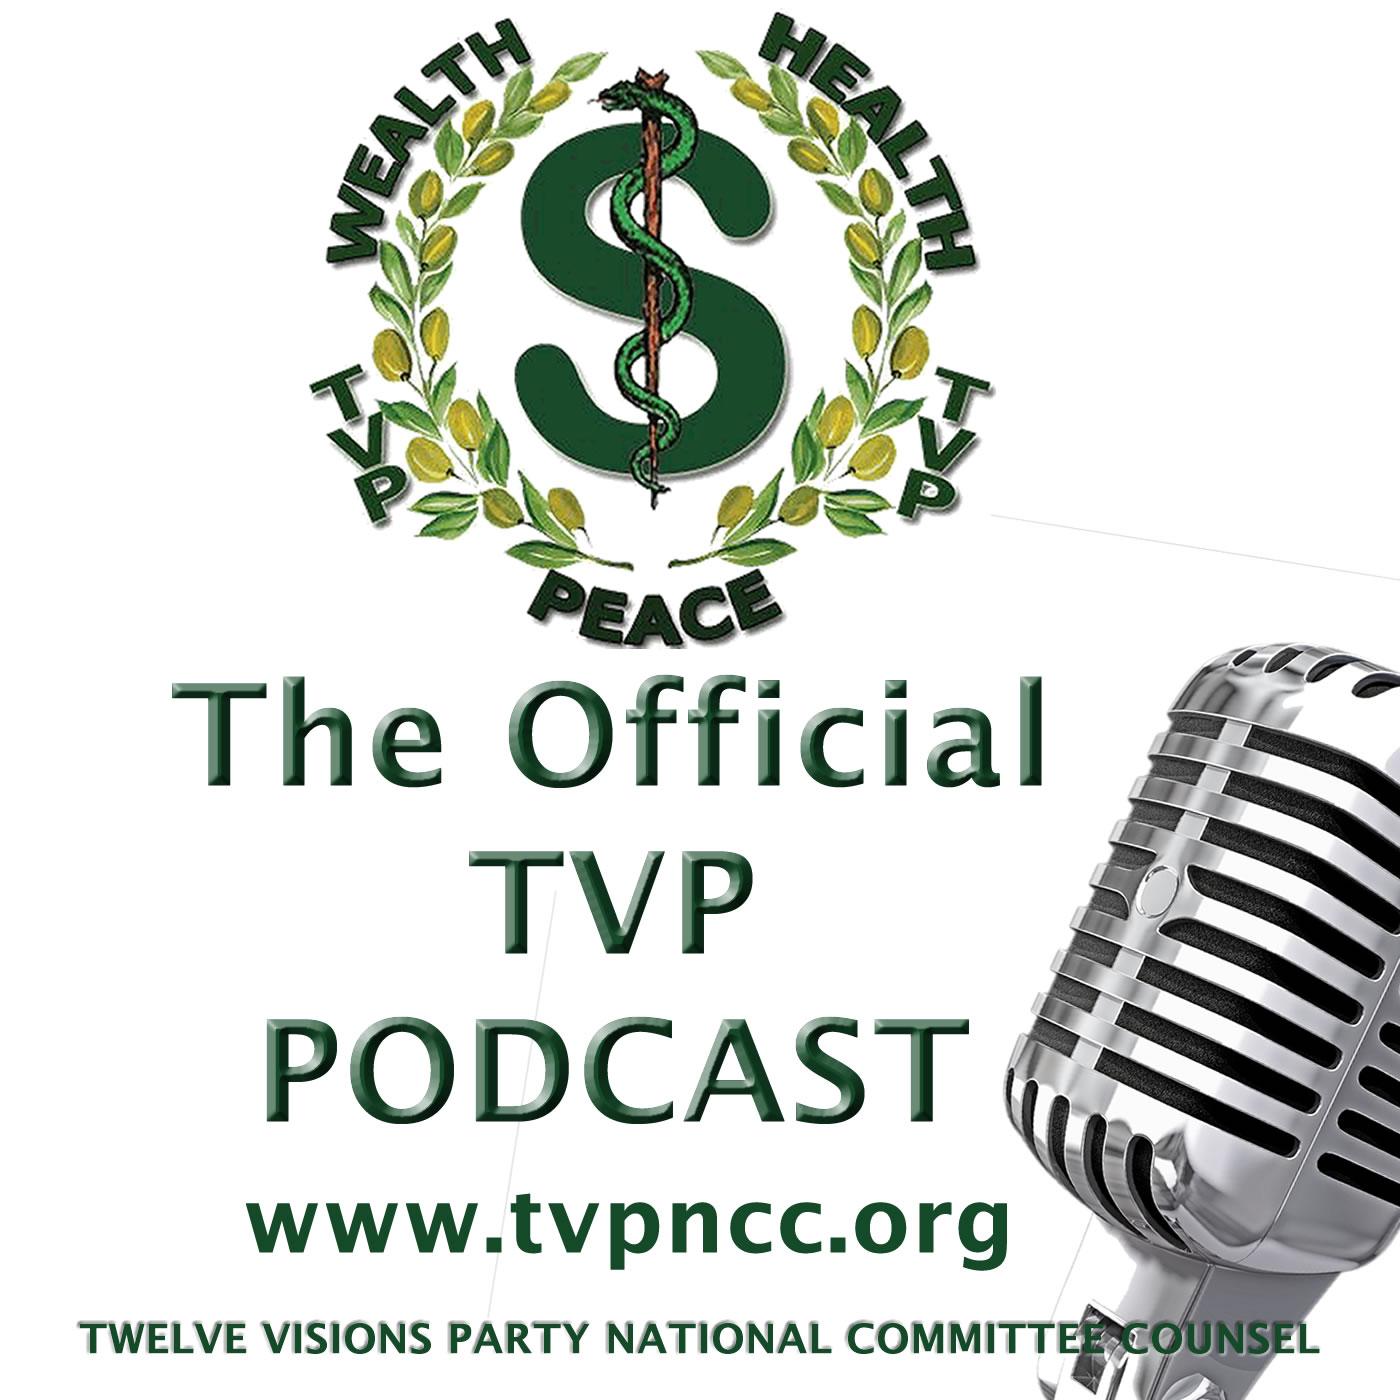 TVPNCC's Podcast